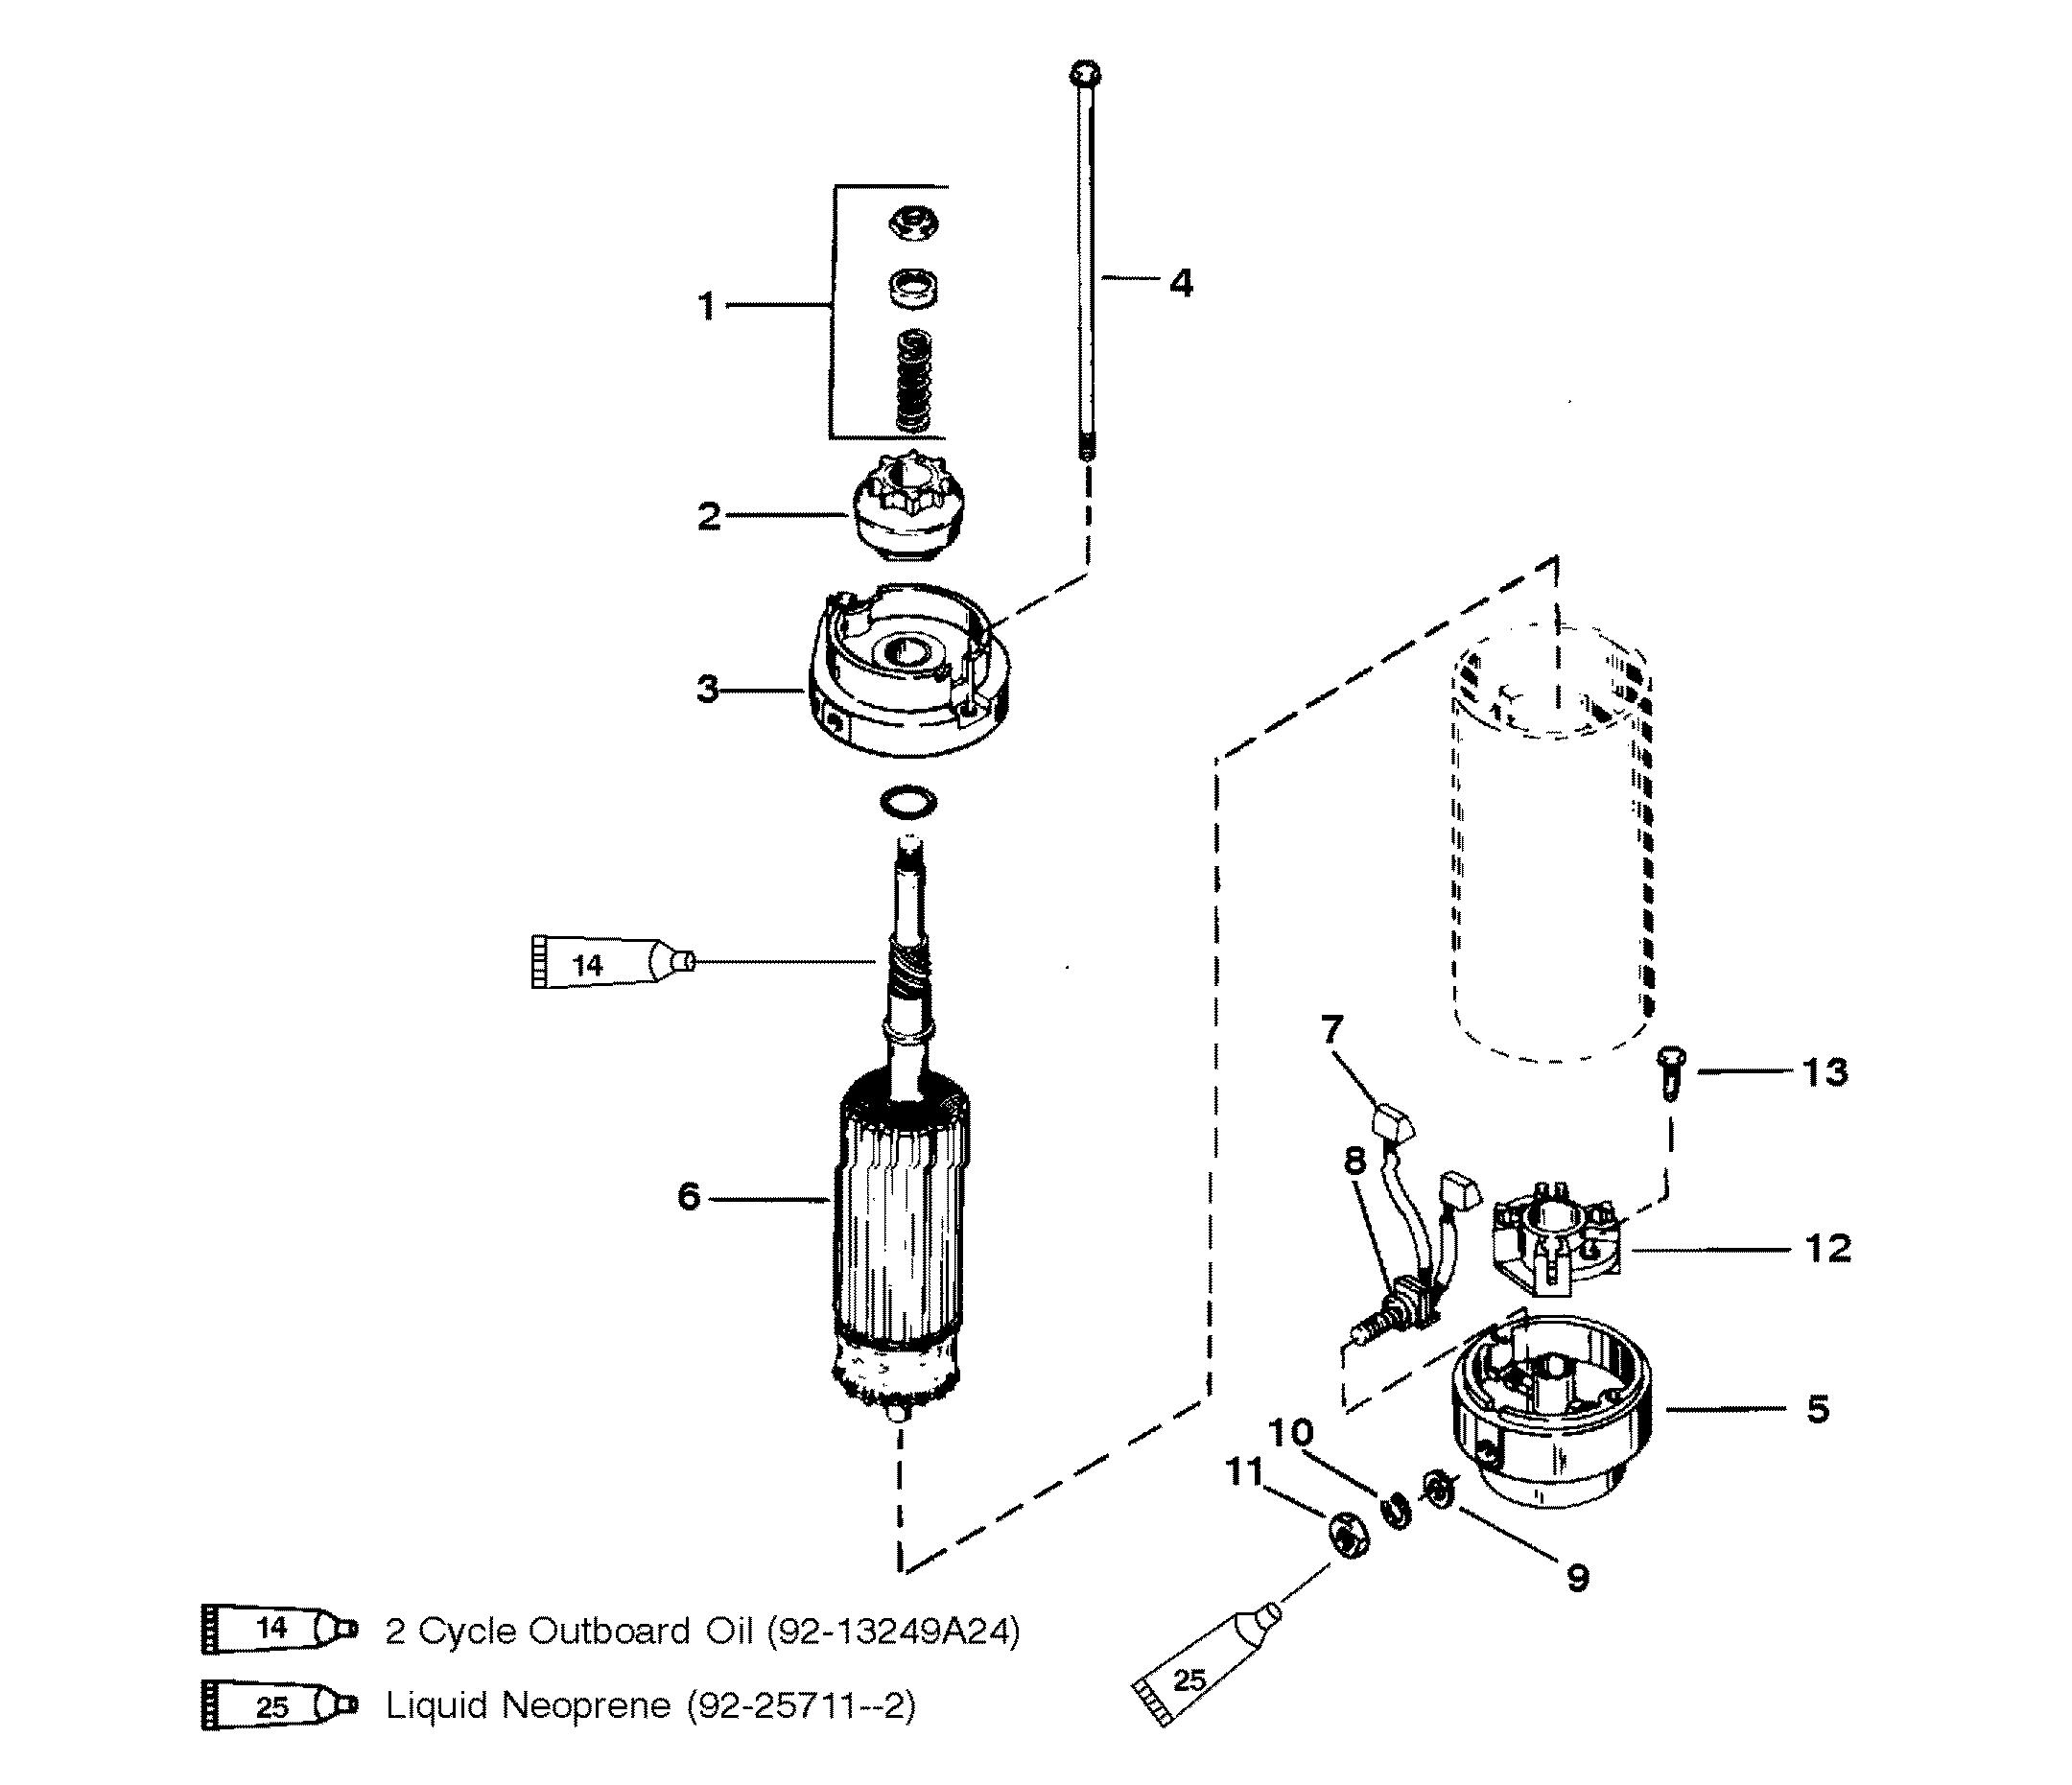 Mariner 50 3 Cyl 0g290585 Thru 0g589999 Diagram Of 8 2 Cyl2strokeinternational Mercury Outboard Starter Motor Assembly